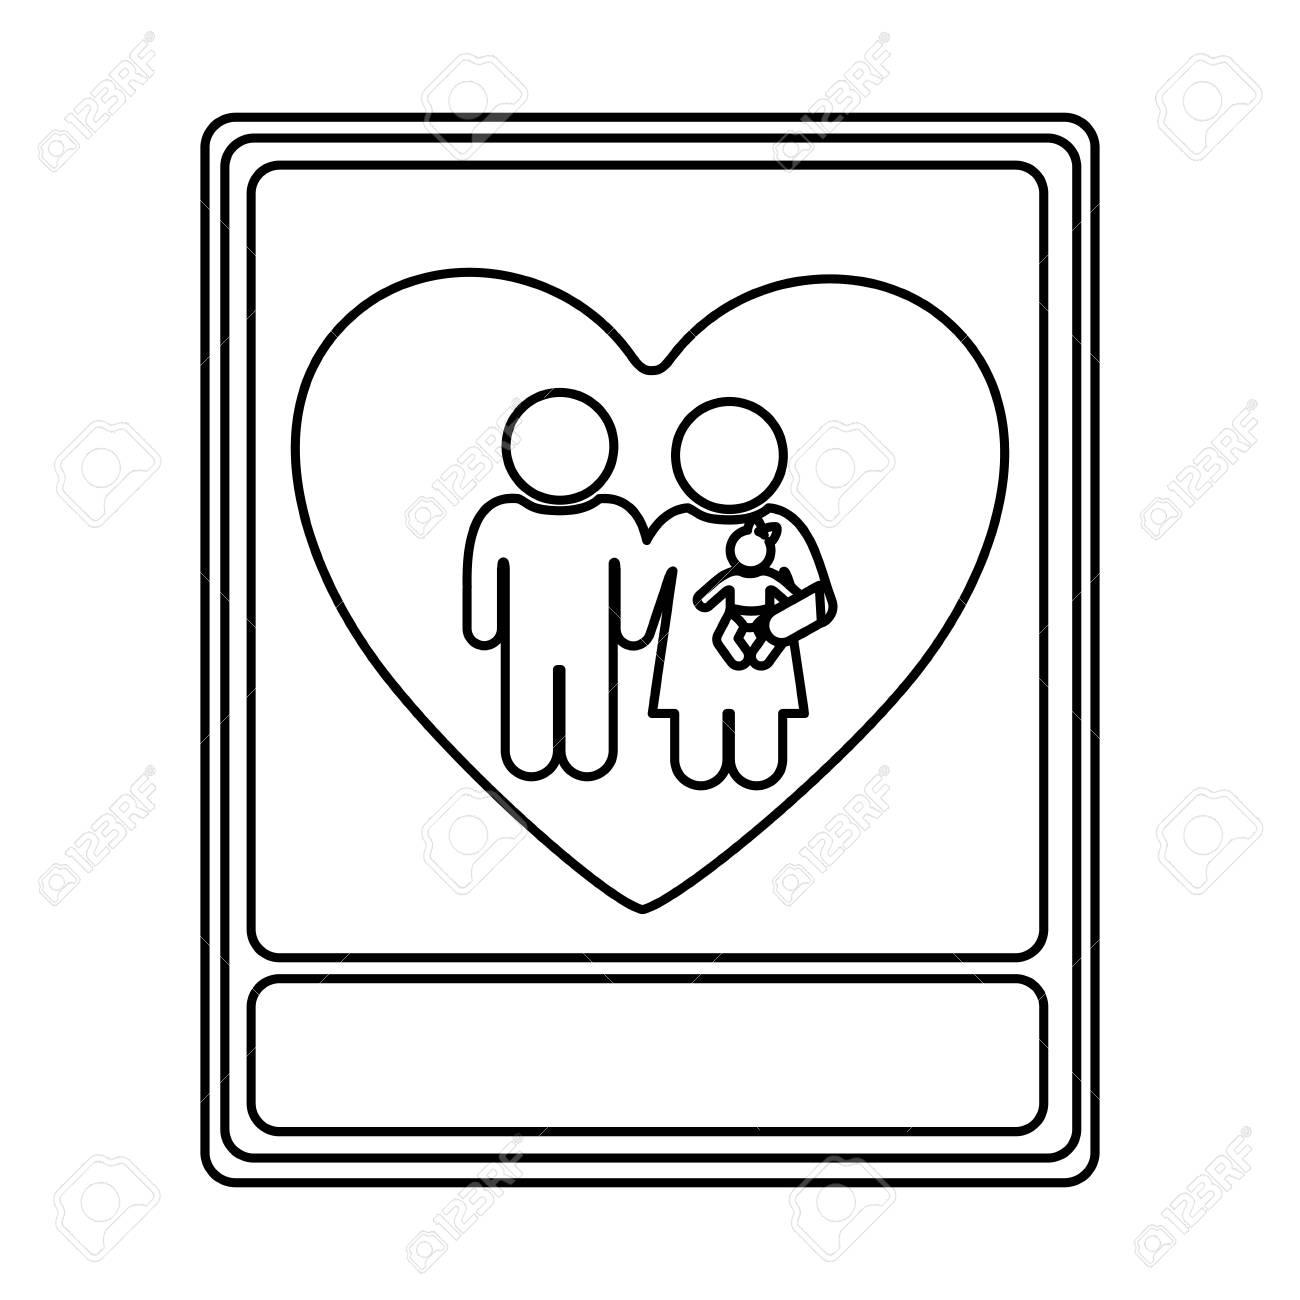 Monochrome Contour With Portrait Of Family Unity Vector Illustration